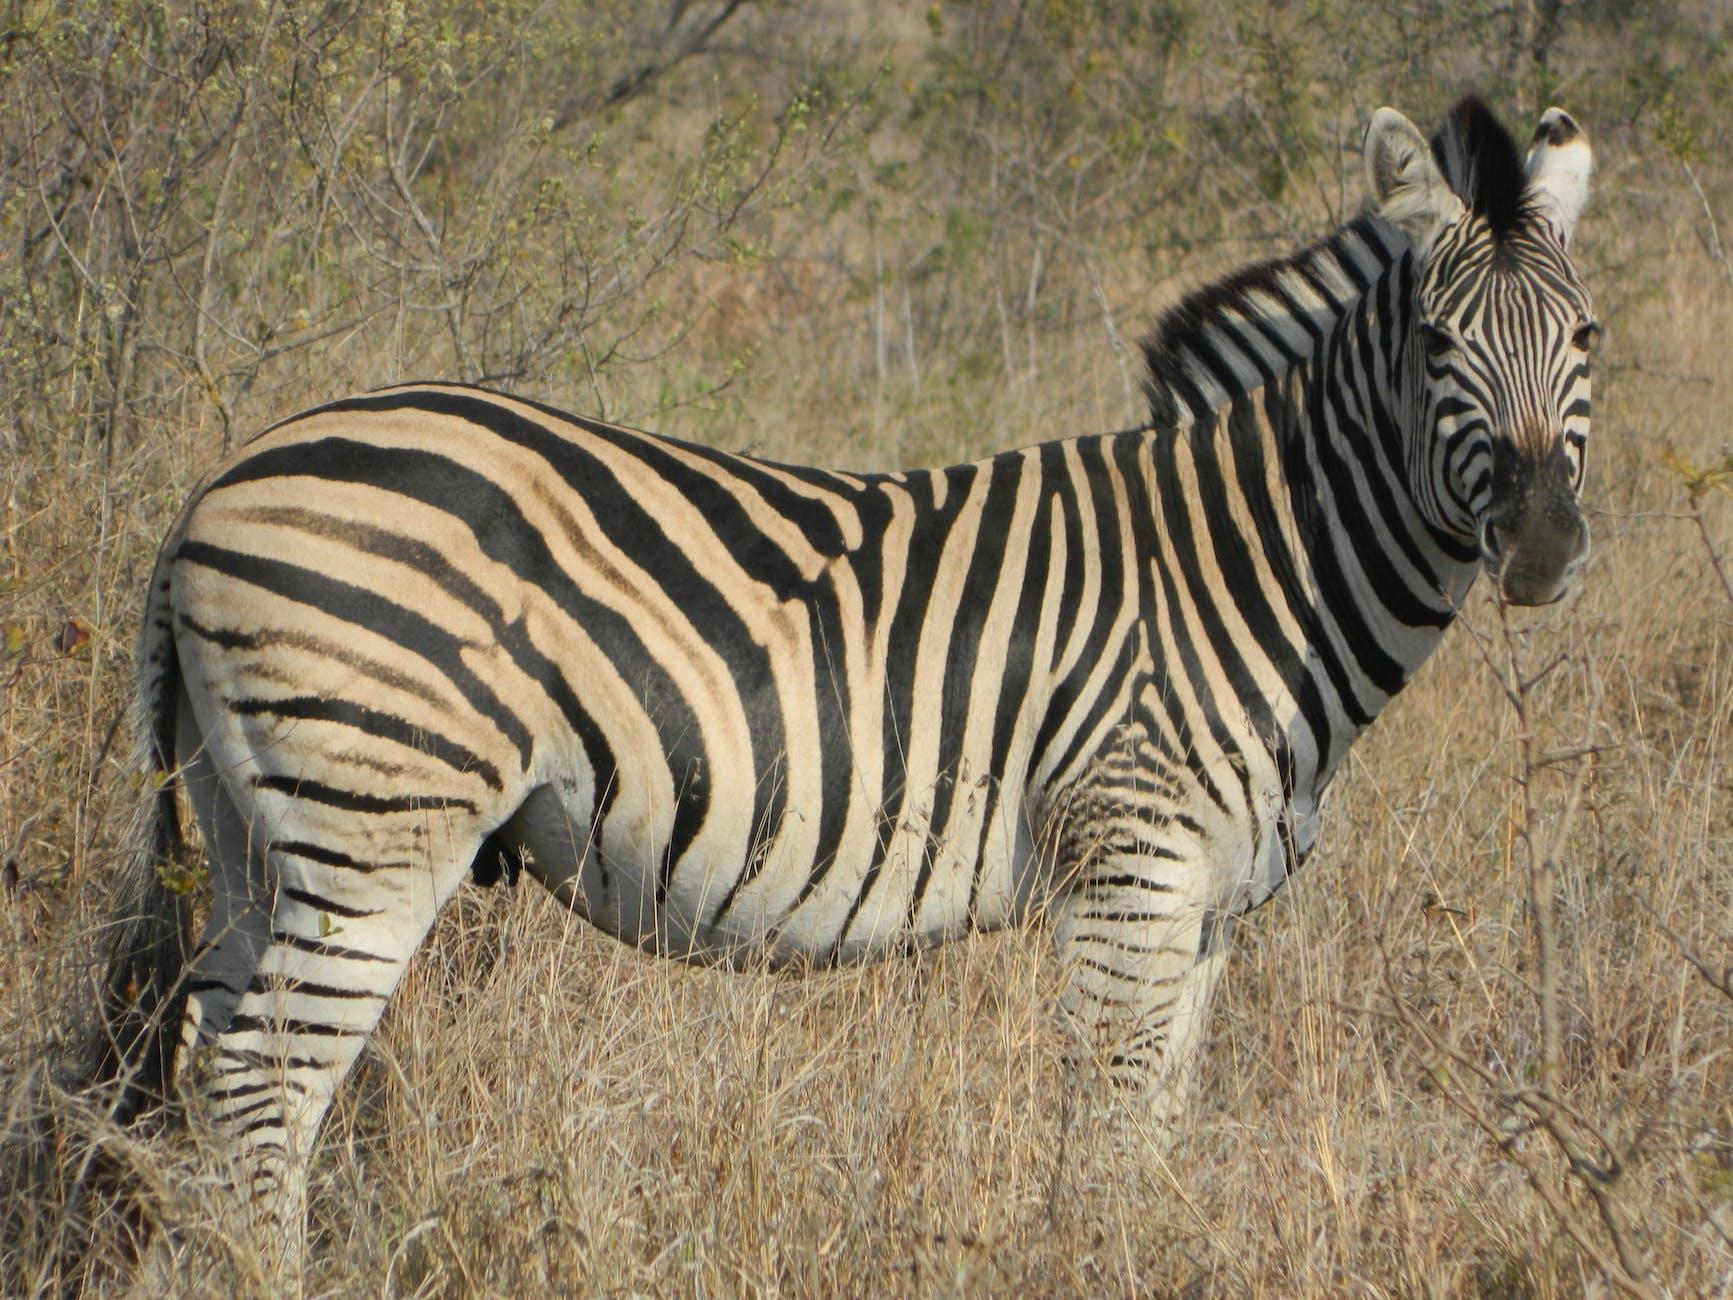 zebra wildlife south africa - HD1280×960